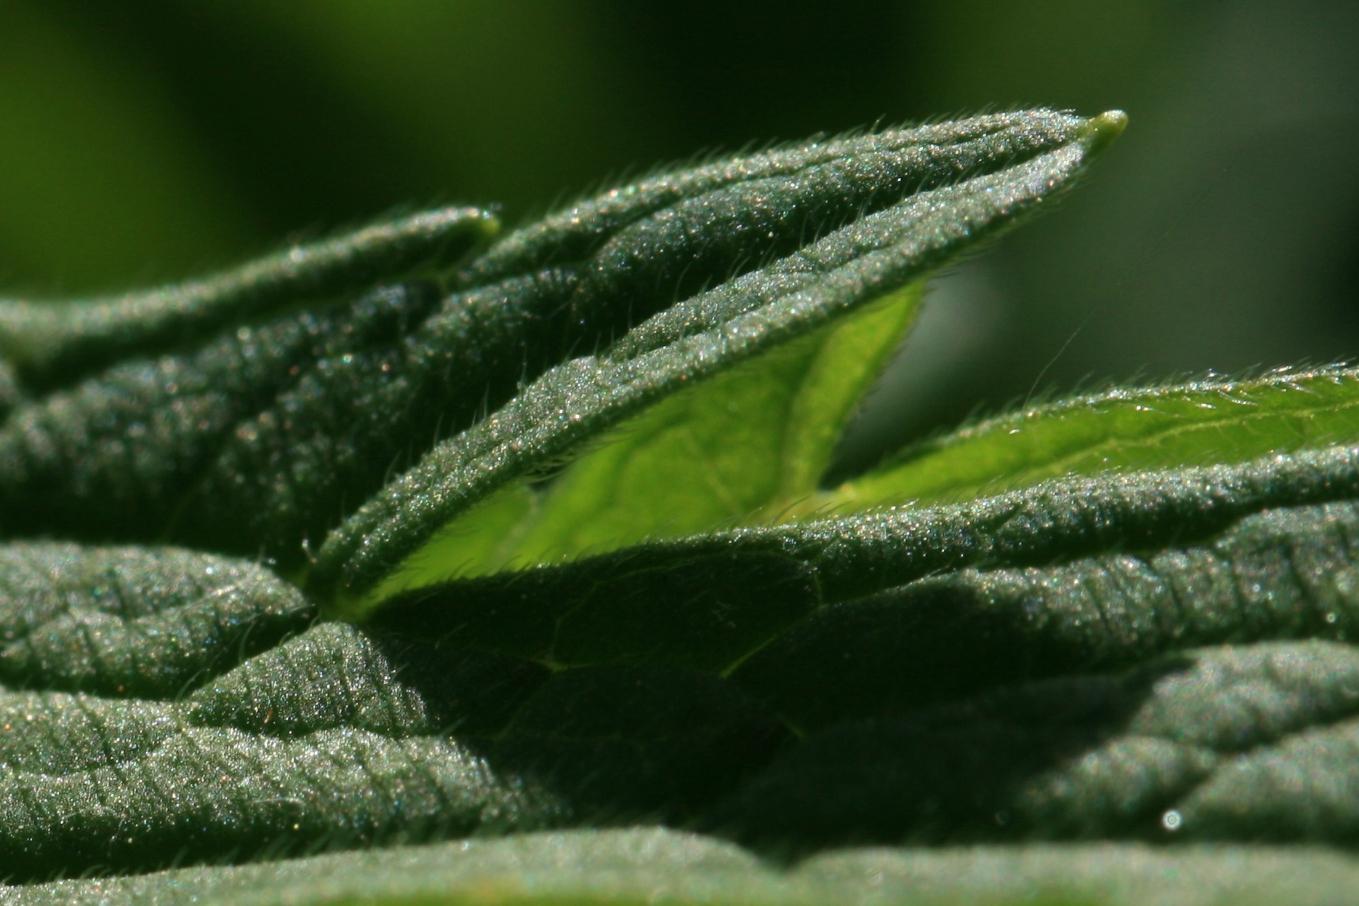 Relay race baton galleryhip com the hippest galleries - Geranium Leaf Close Up Source Wikicommons